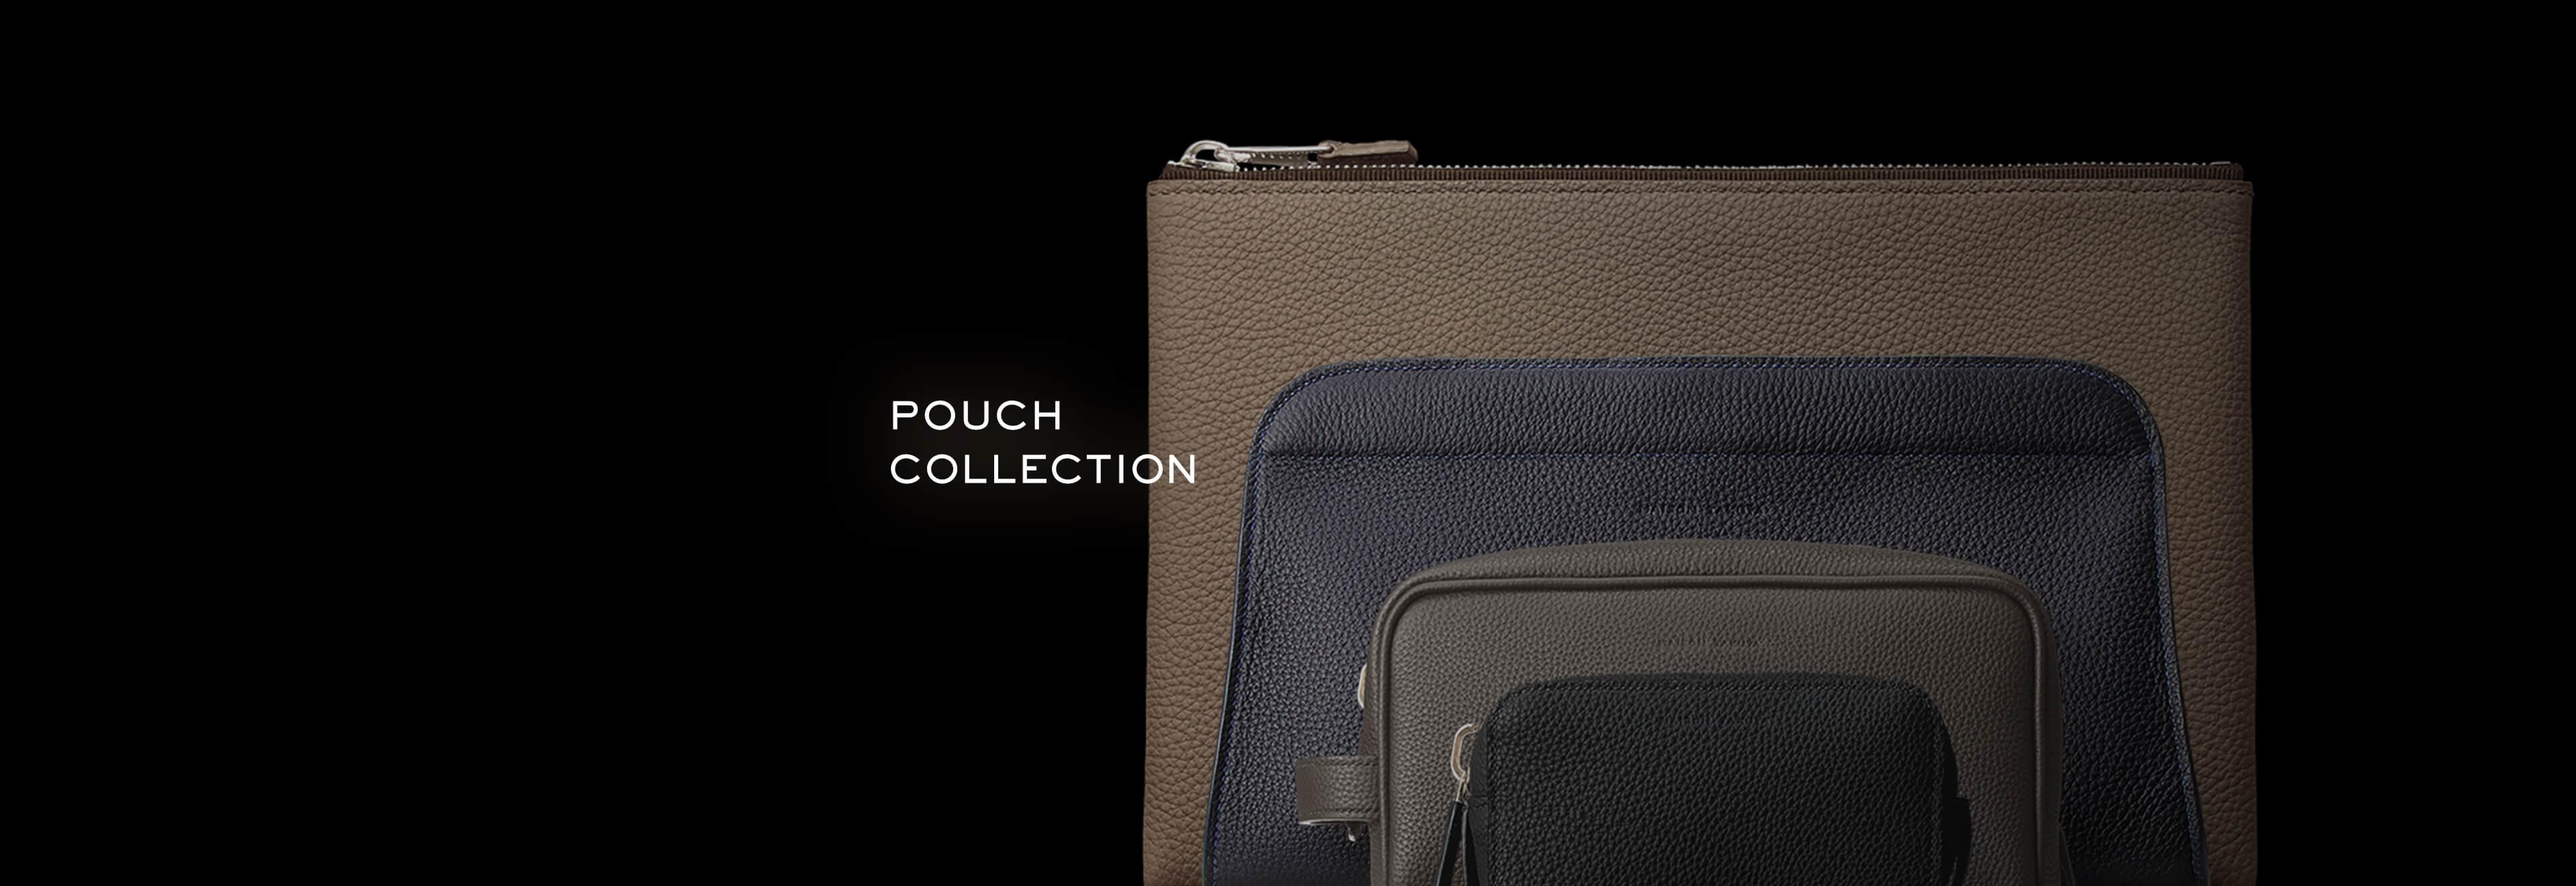 CLUTCH BAG & POUCH